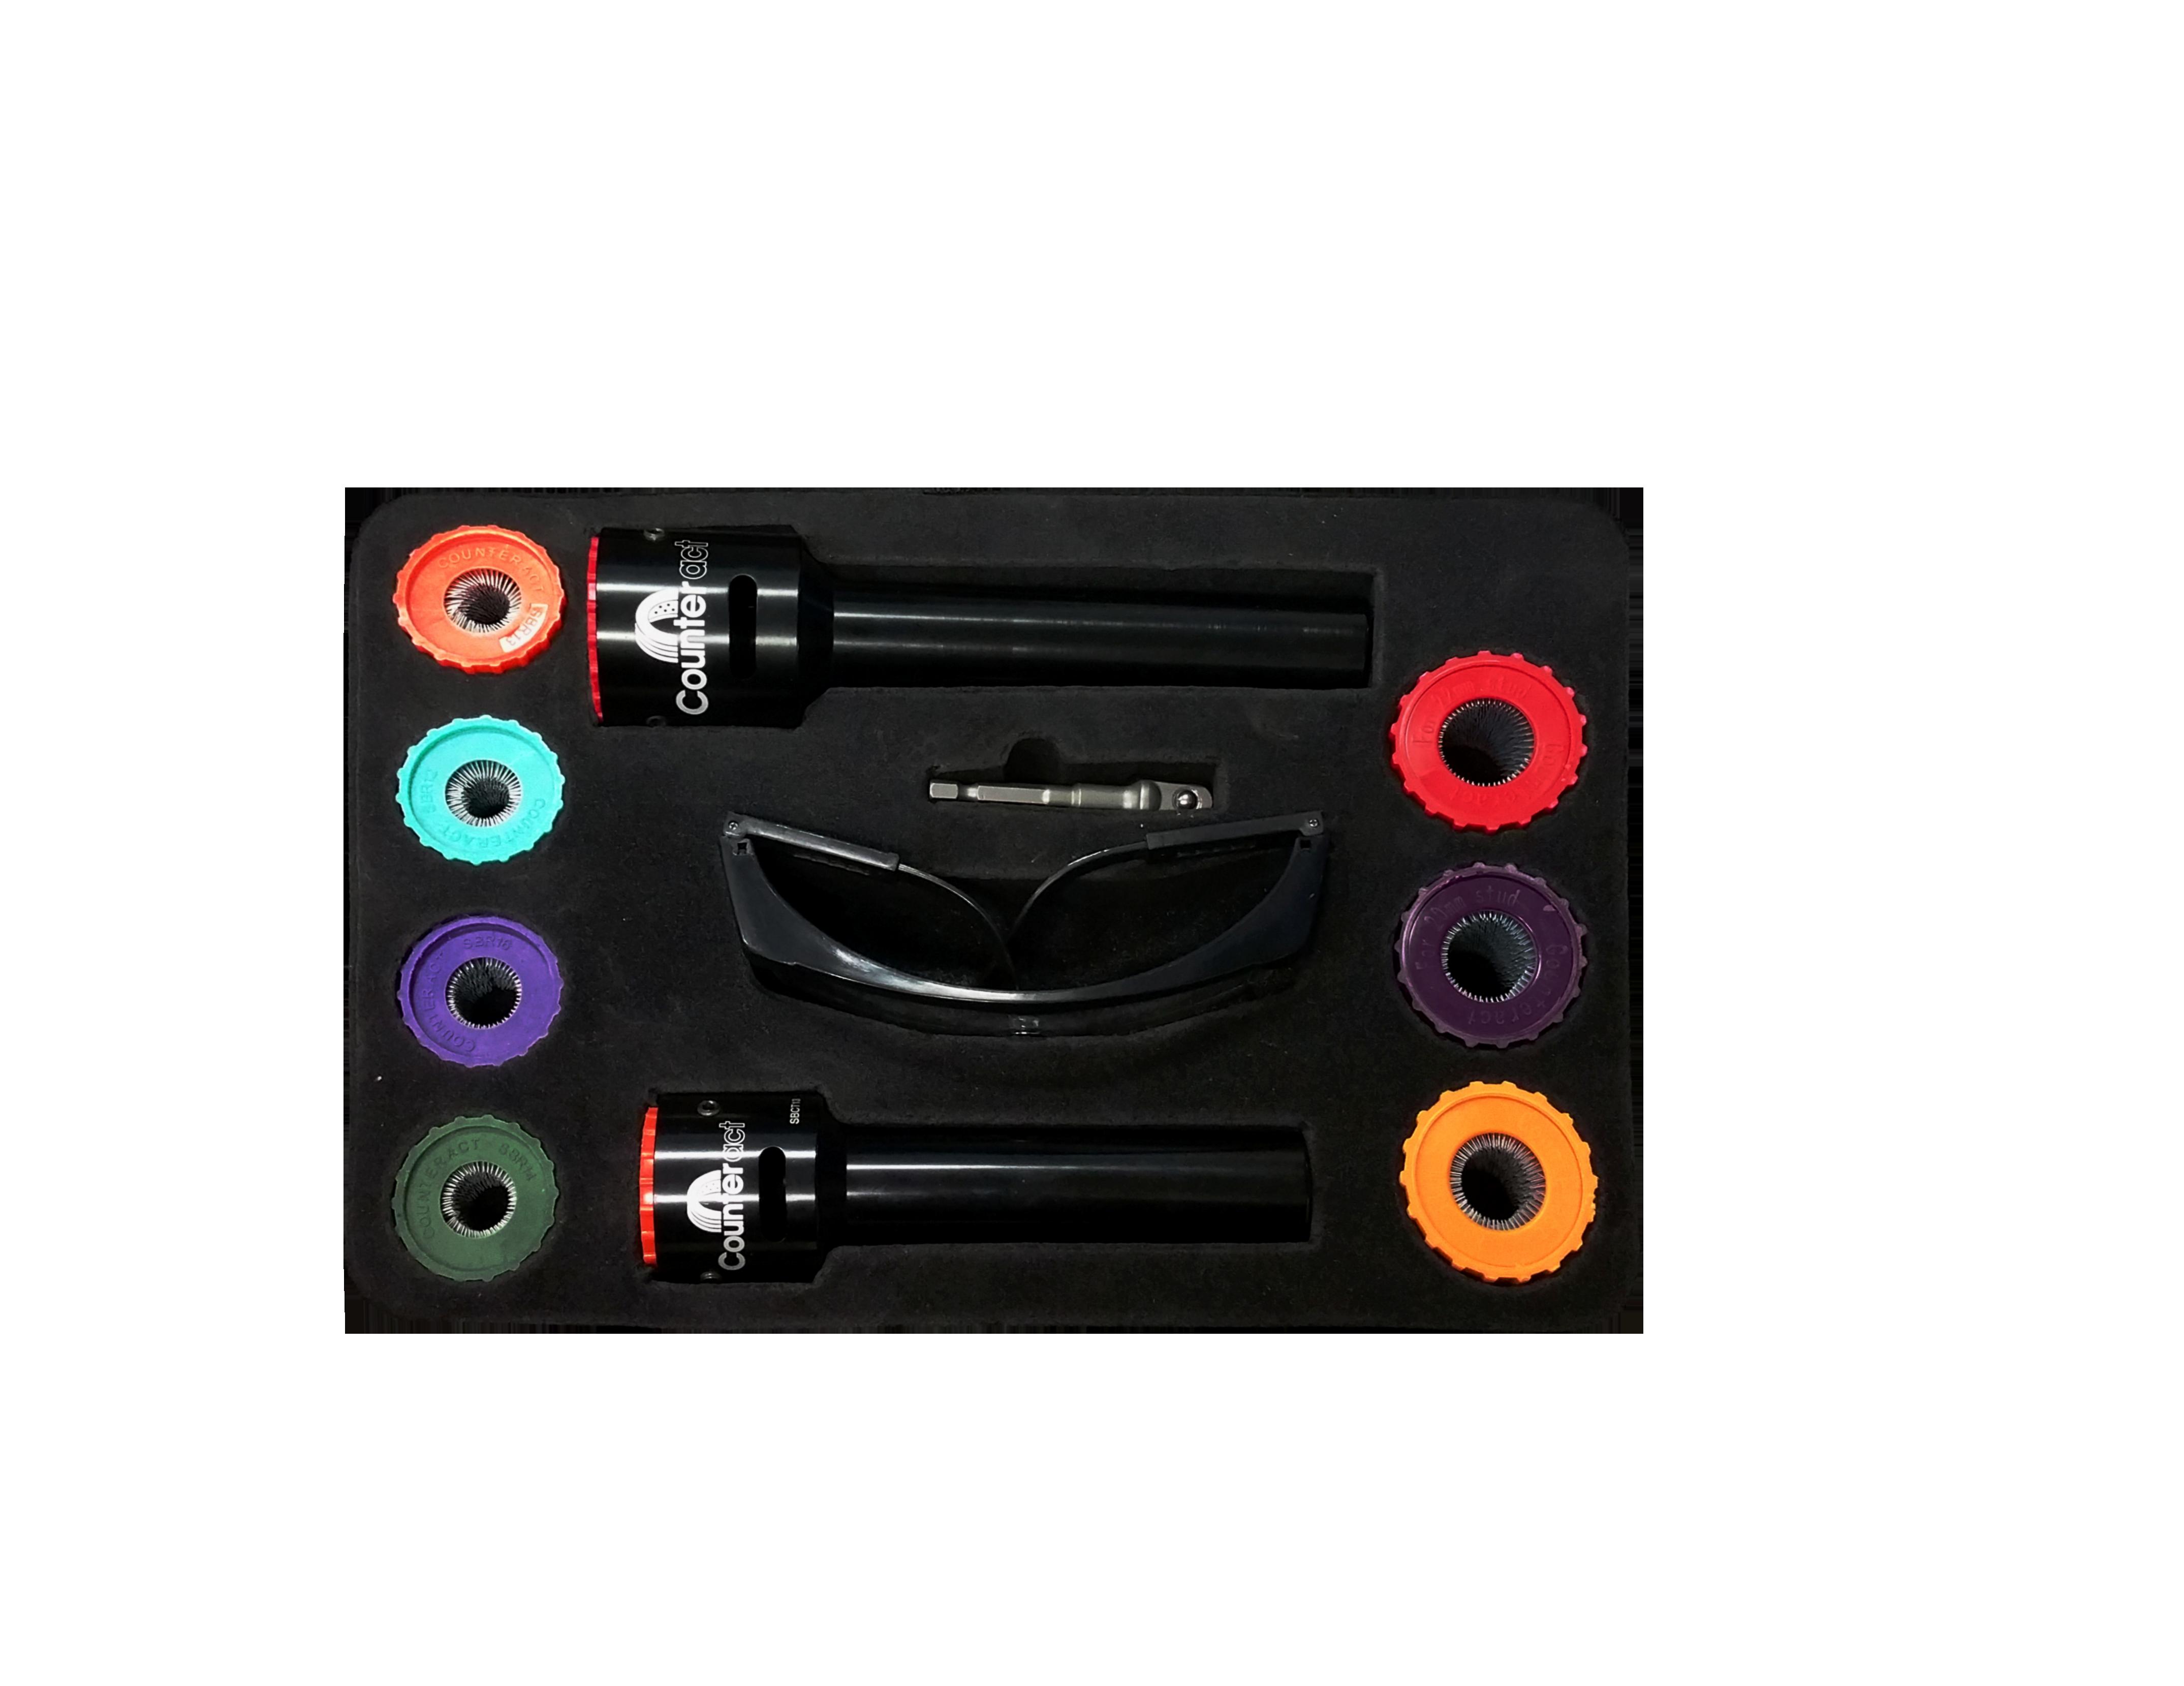 STK-1322 Stud Cleaning Kit Image